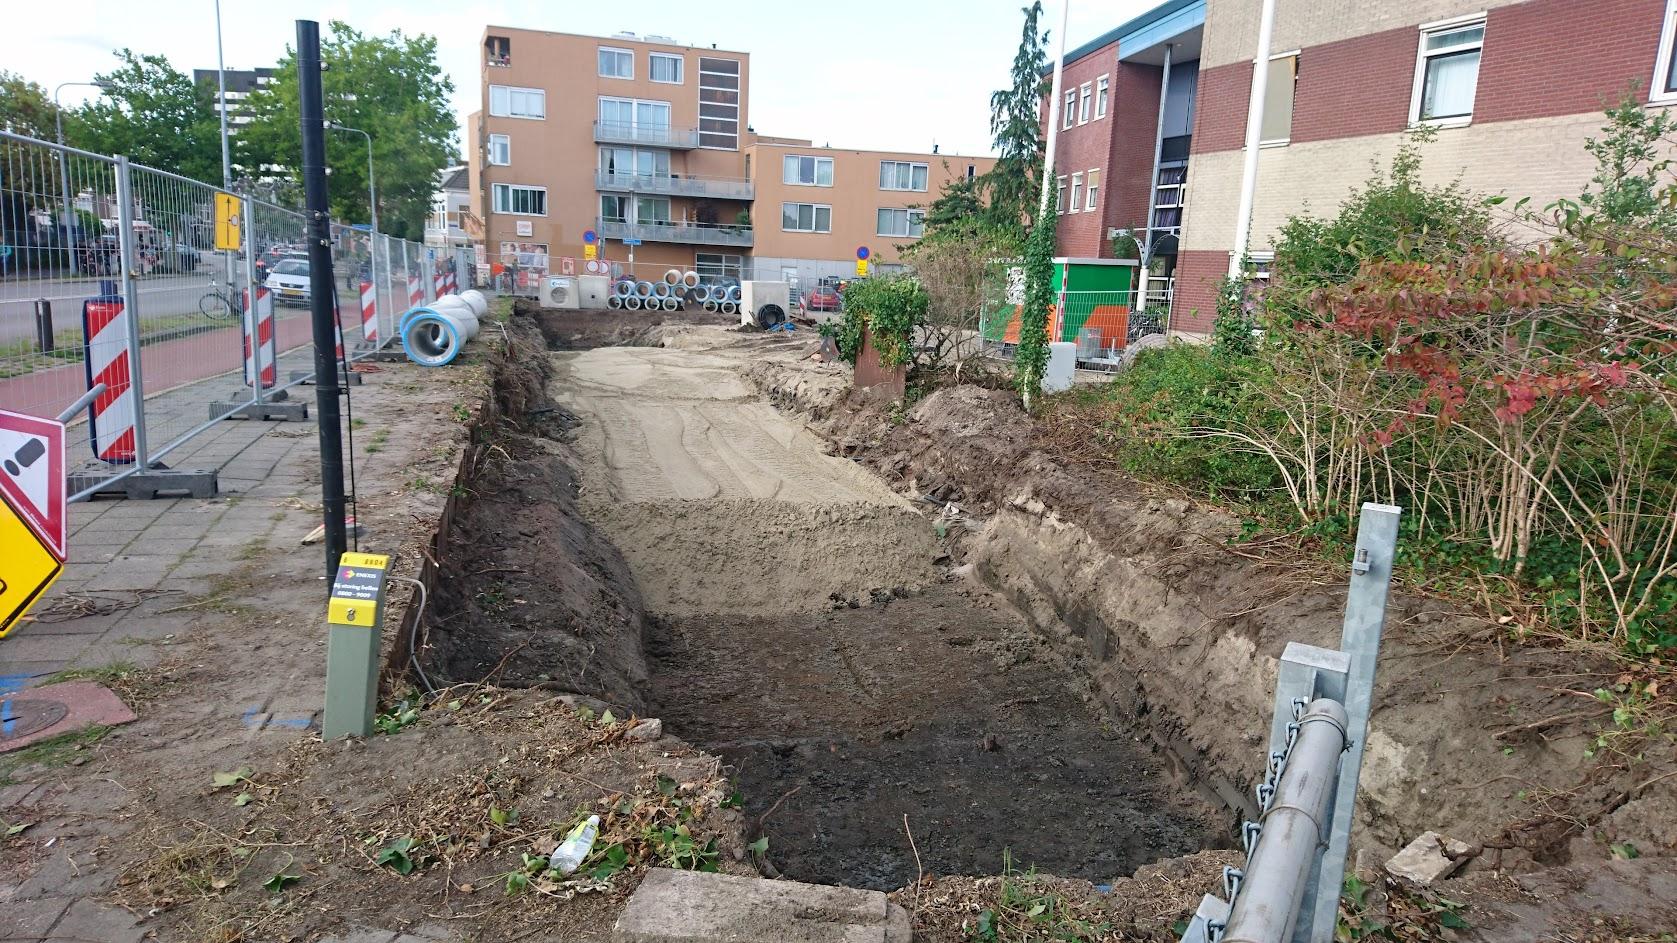 zandvlakte jongerenhuisvesting